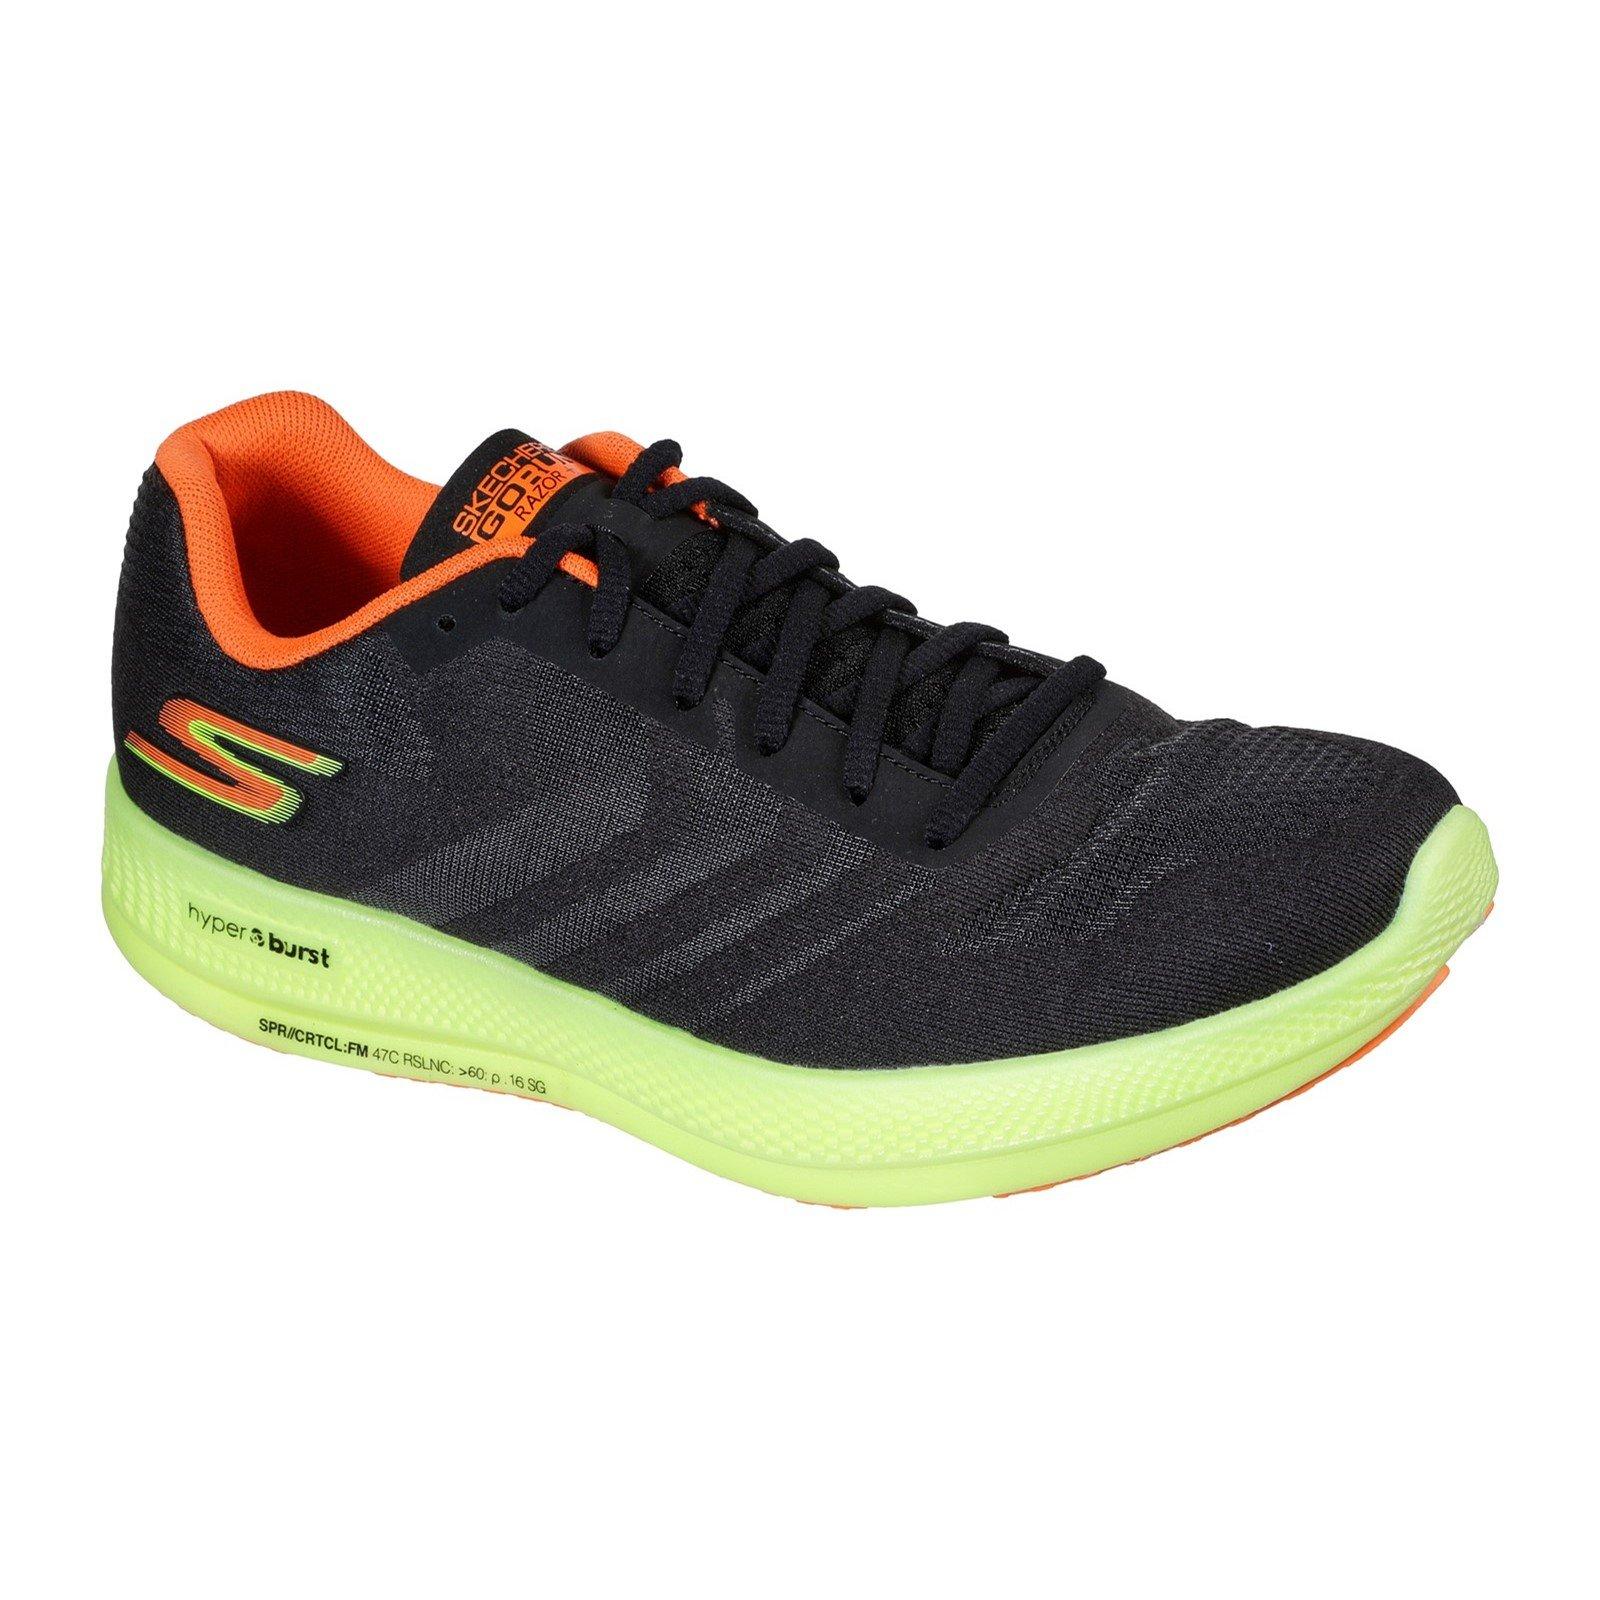 Skechers Women's Go Run Razor Trainer Various Colours 32703 - Black/Yellow/Orange 8